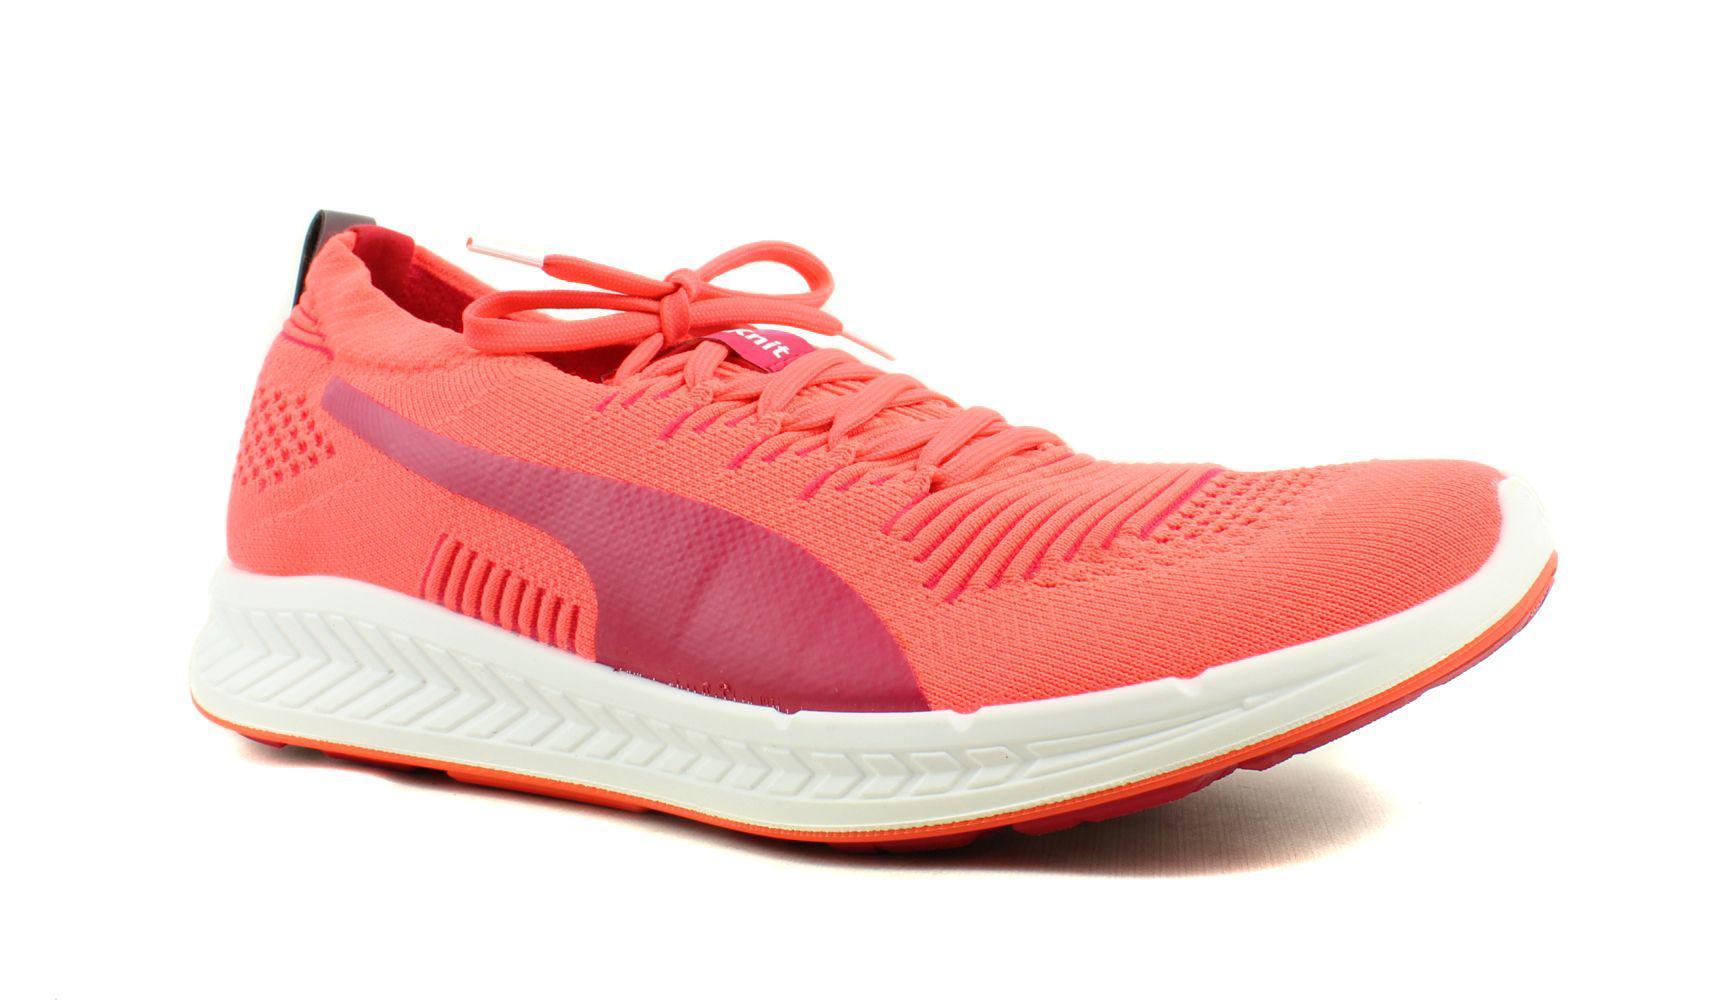 143b5549d63f65 Lyst - Puma Womens Ignite Proknit Orange Running Shoes in Red